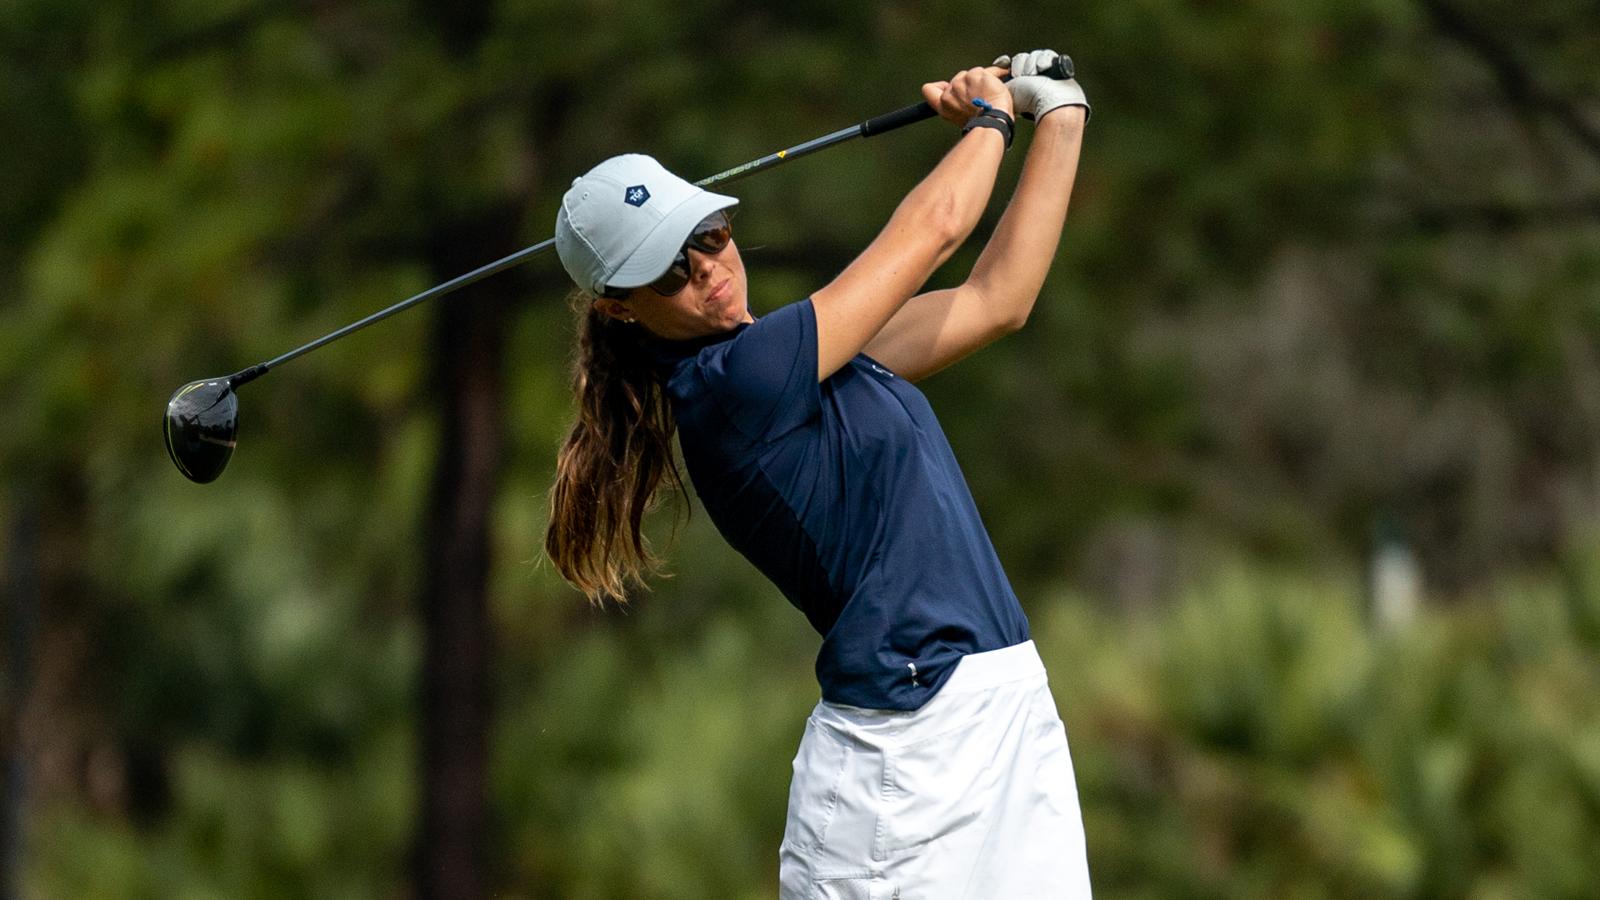 Allie Knight, PGA